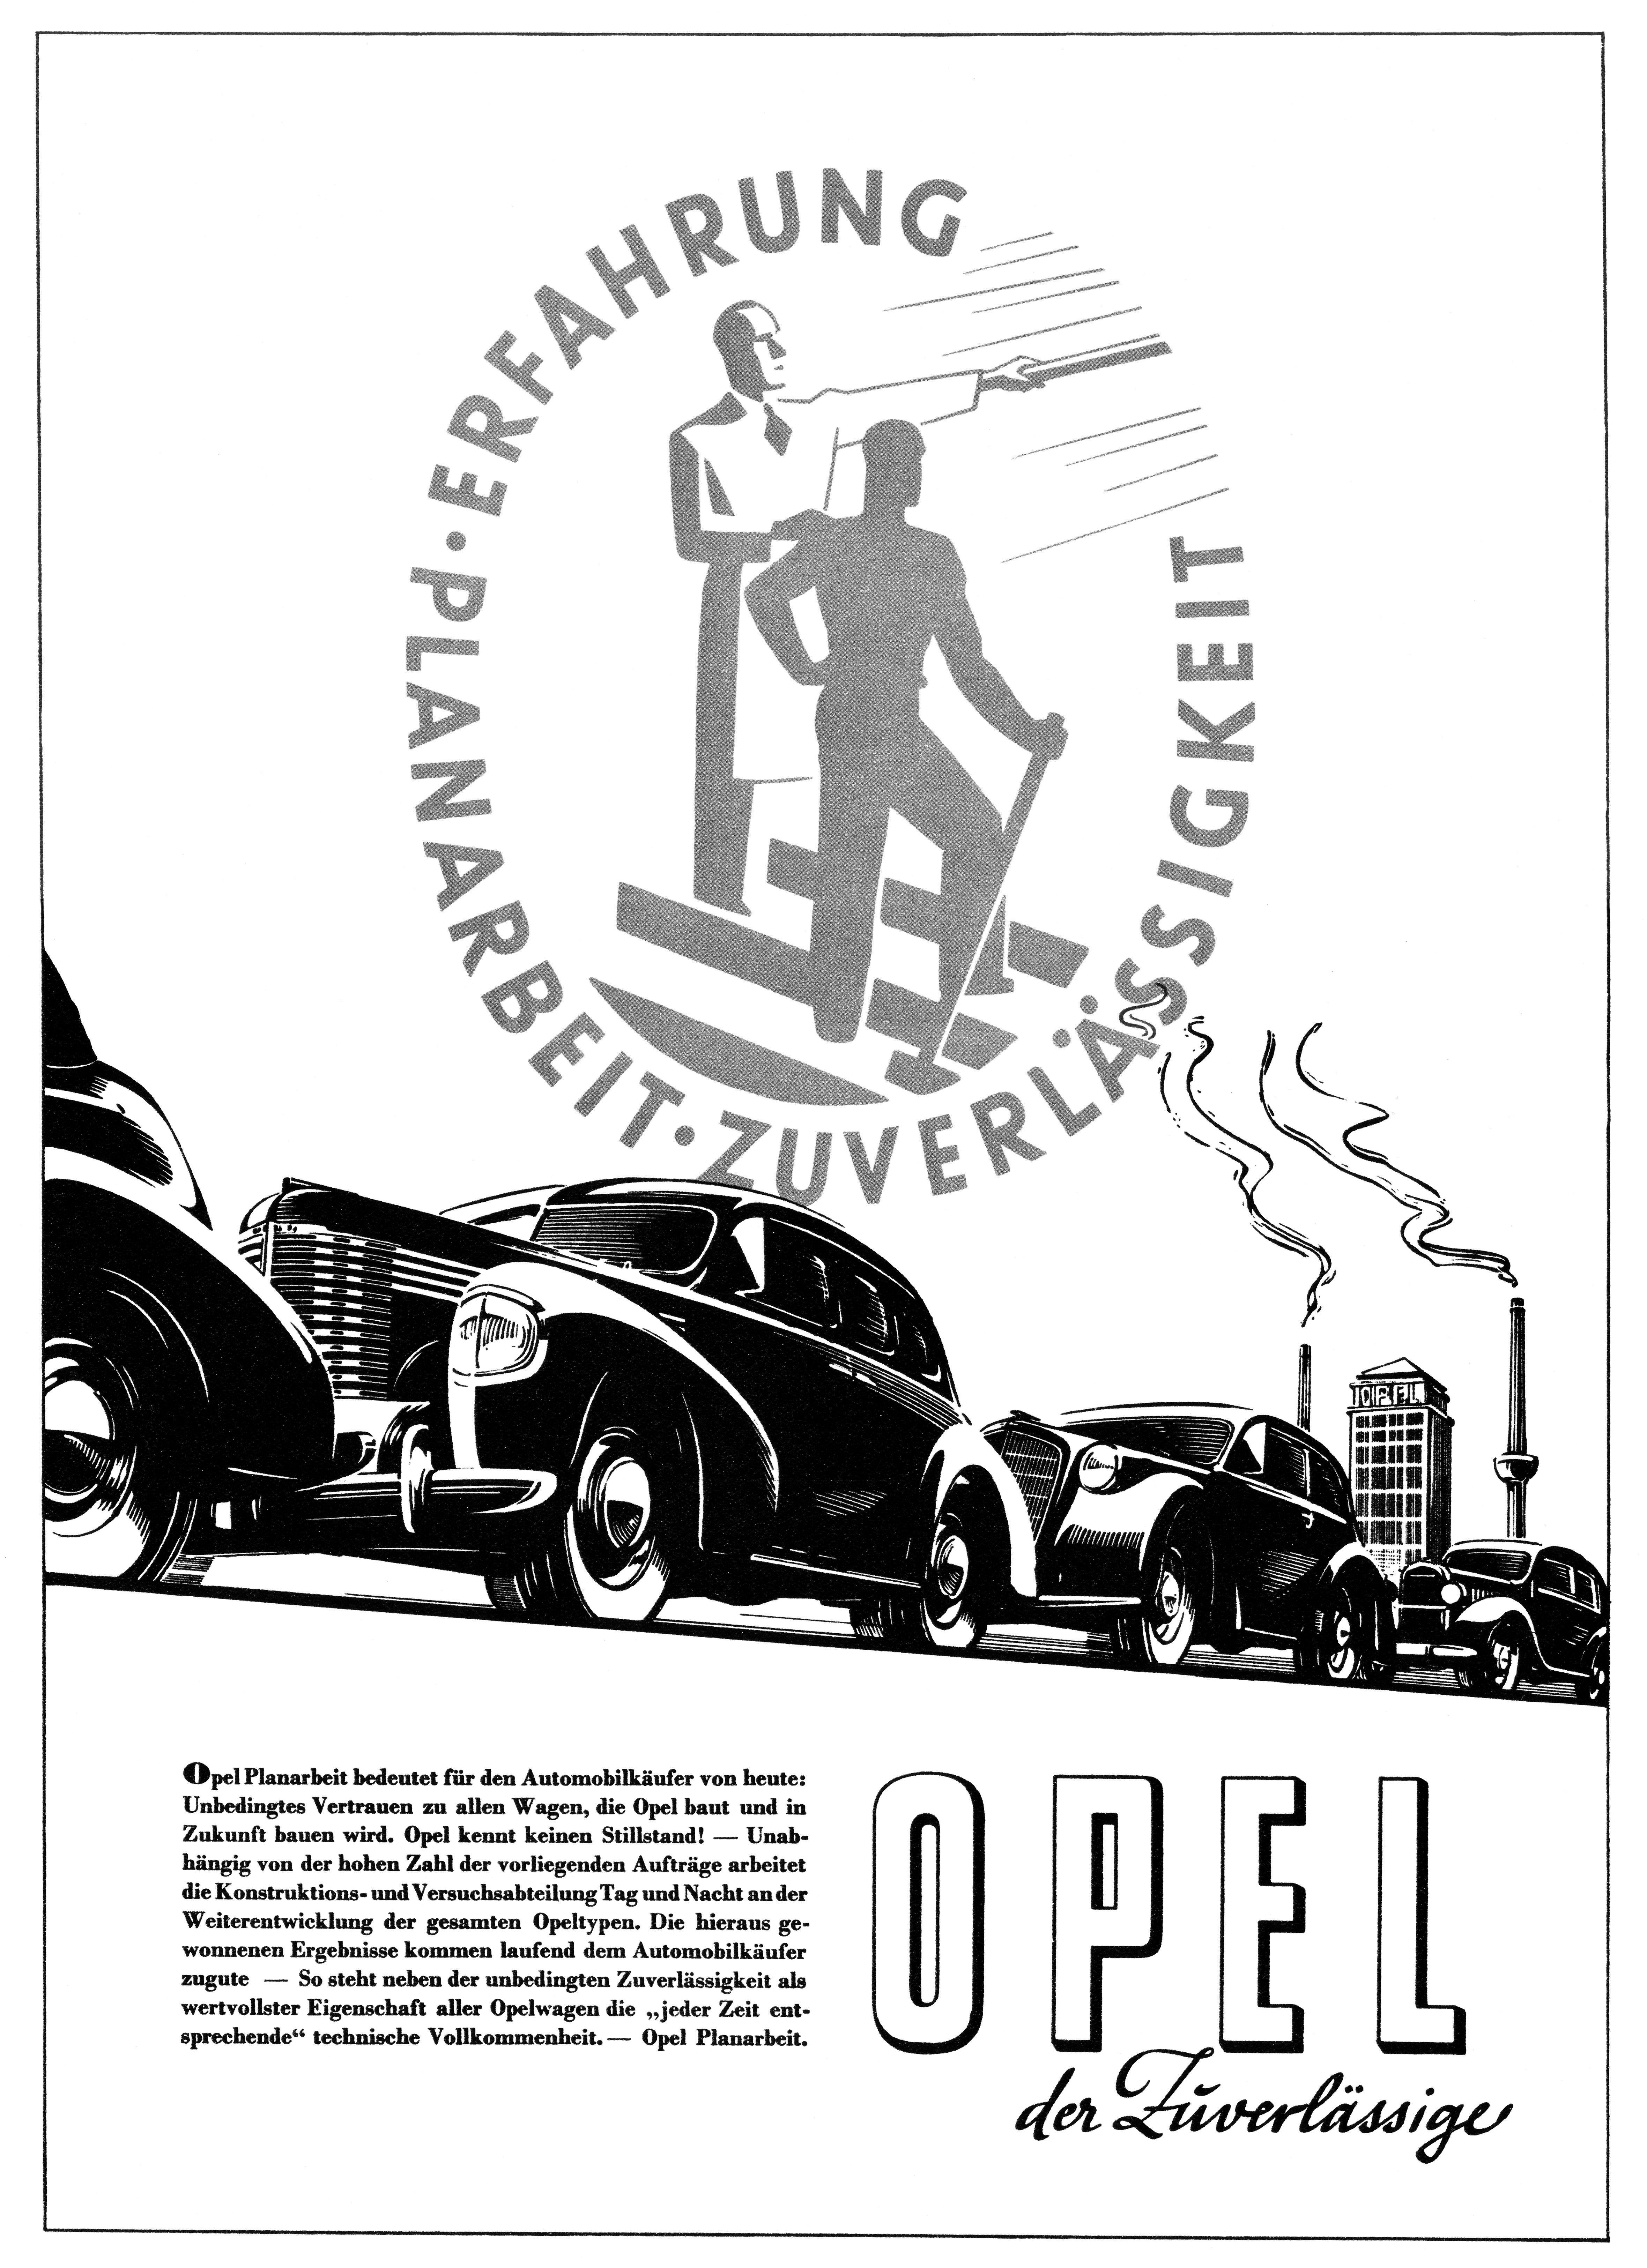 Opel Reklame Opel Reklamer Autos